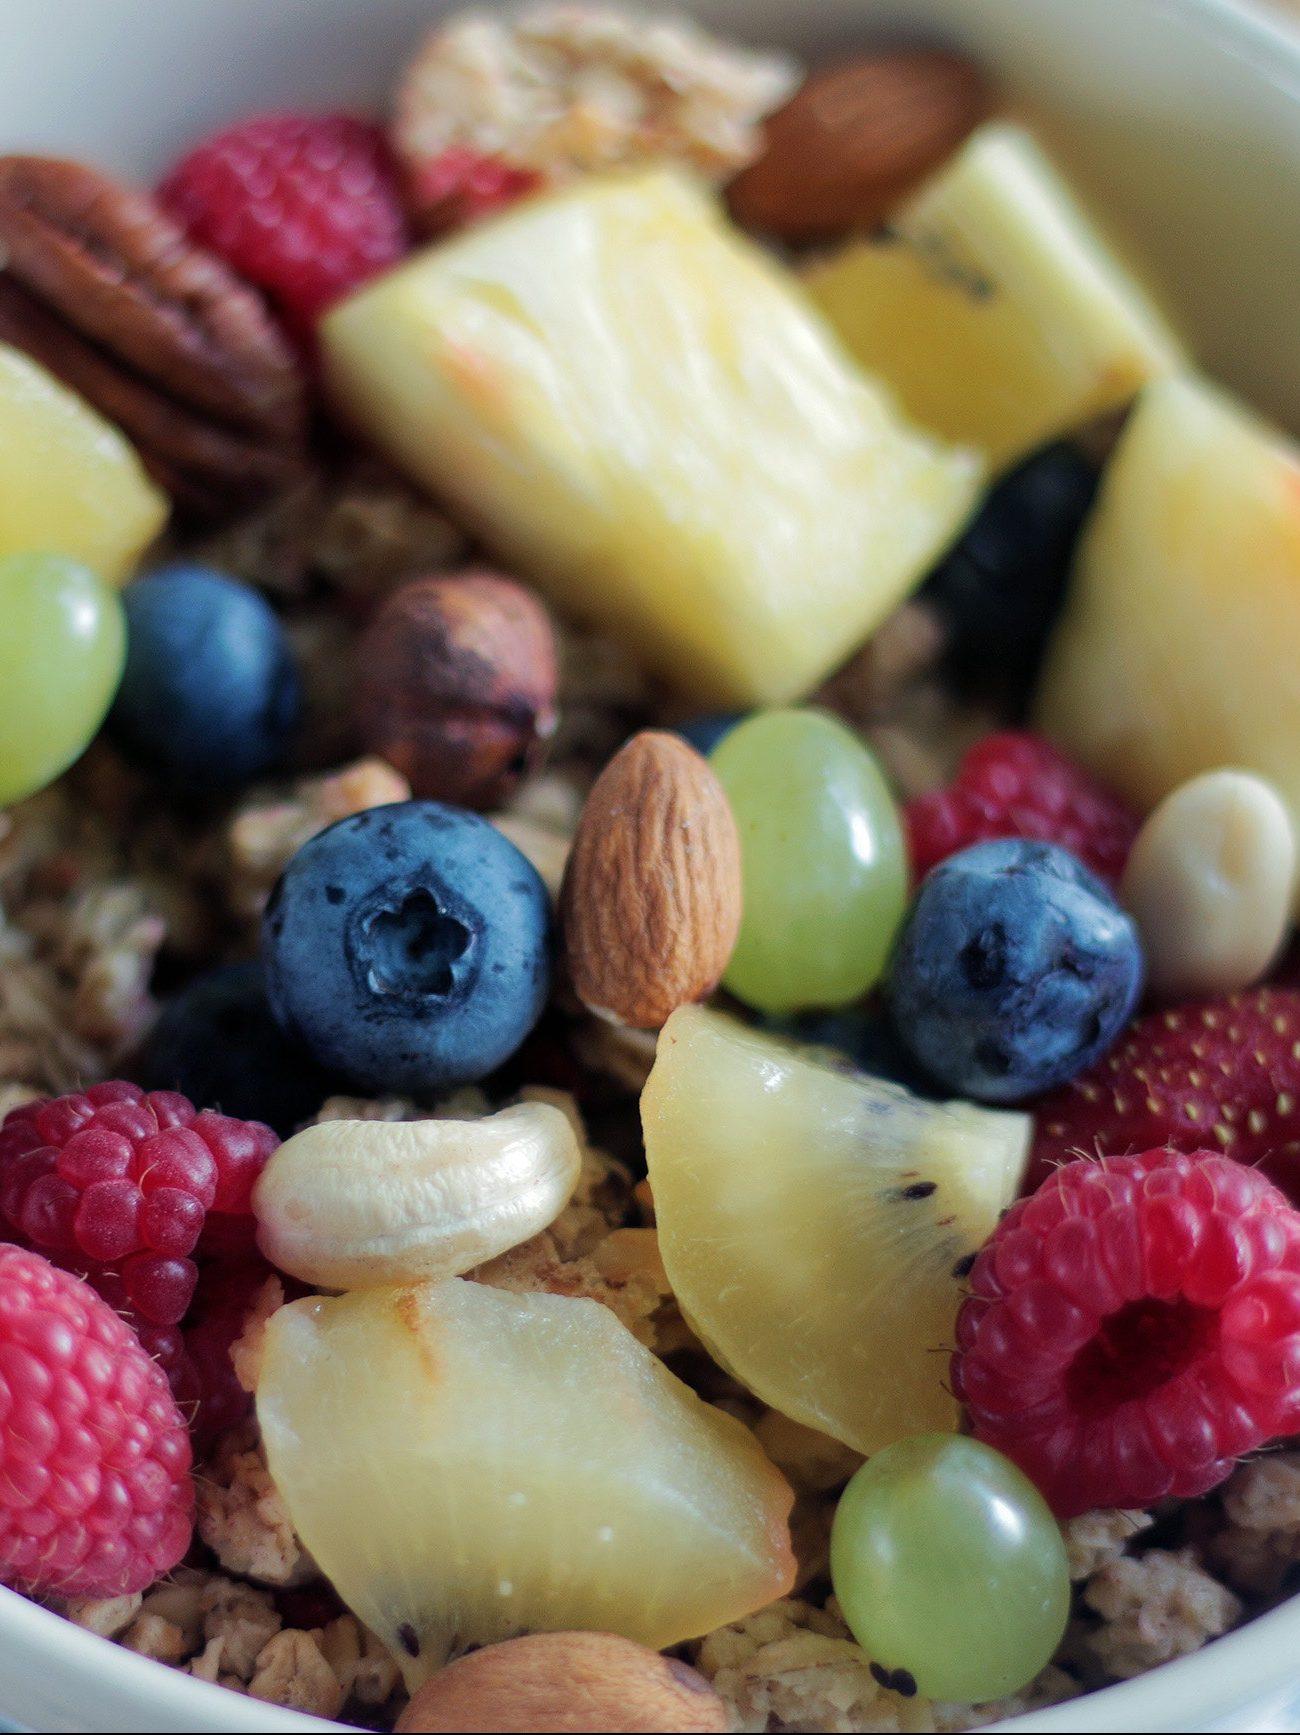 blueberries-breakfast-fruits-4972